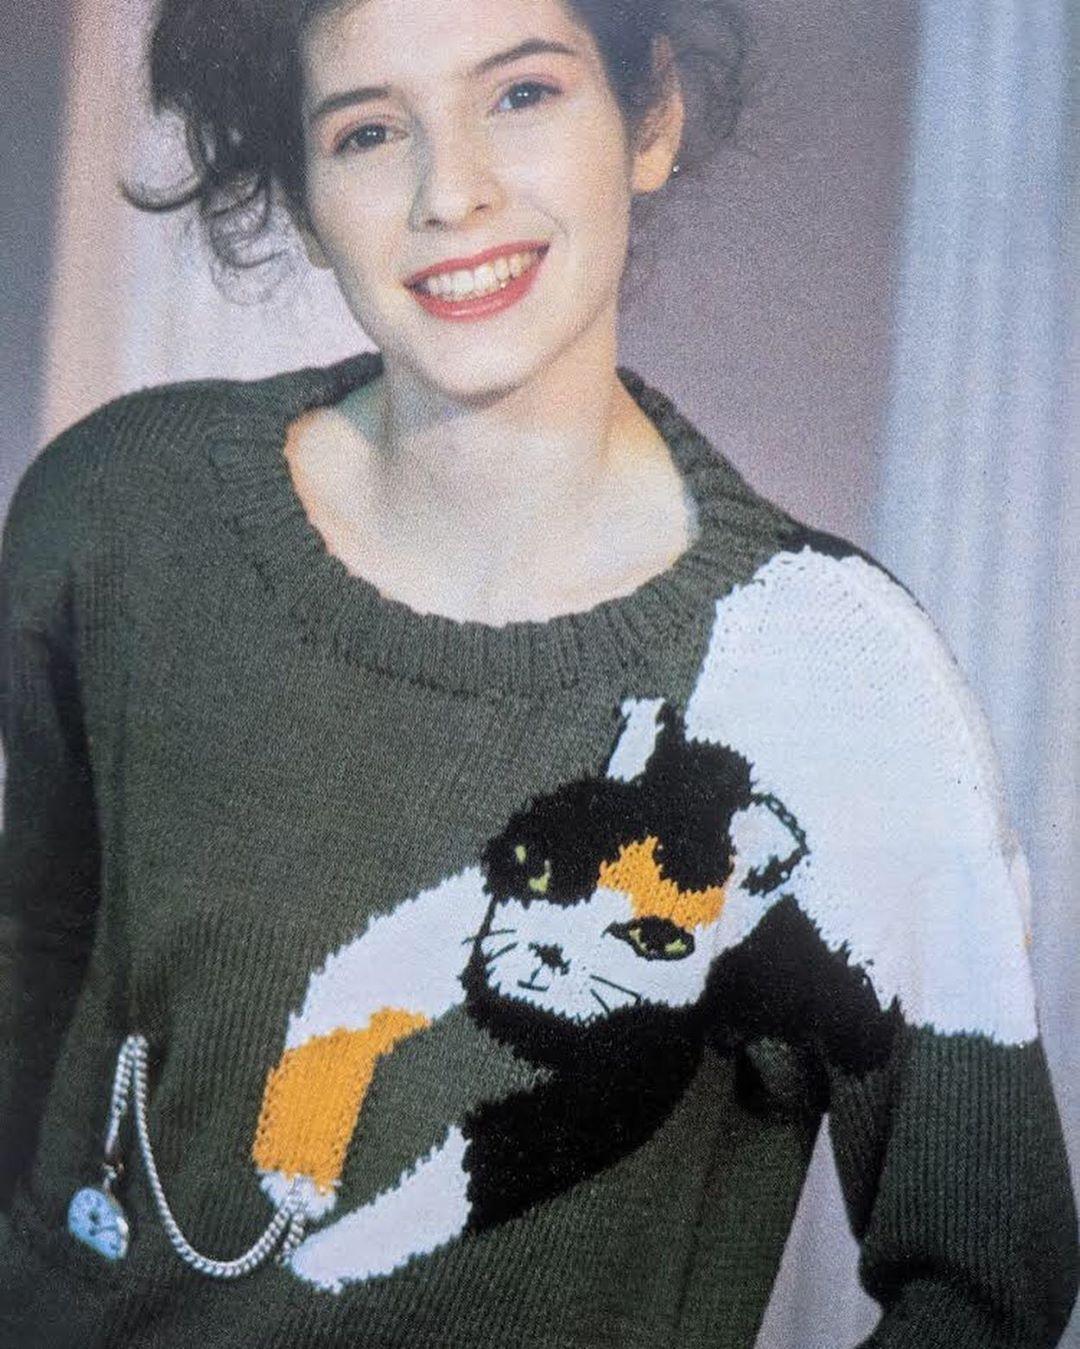 80s-cat-knits-1 (1)222.JPG